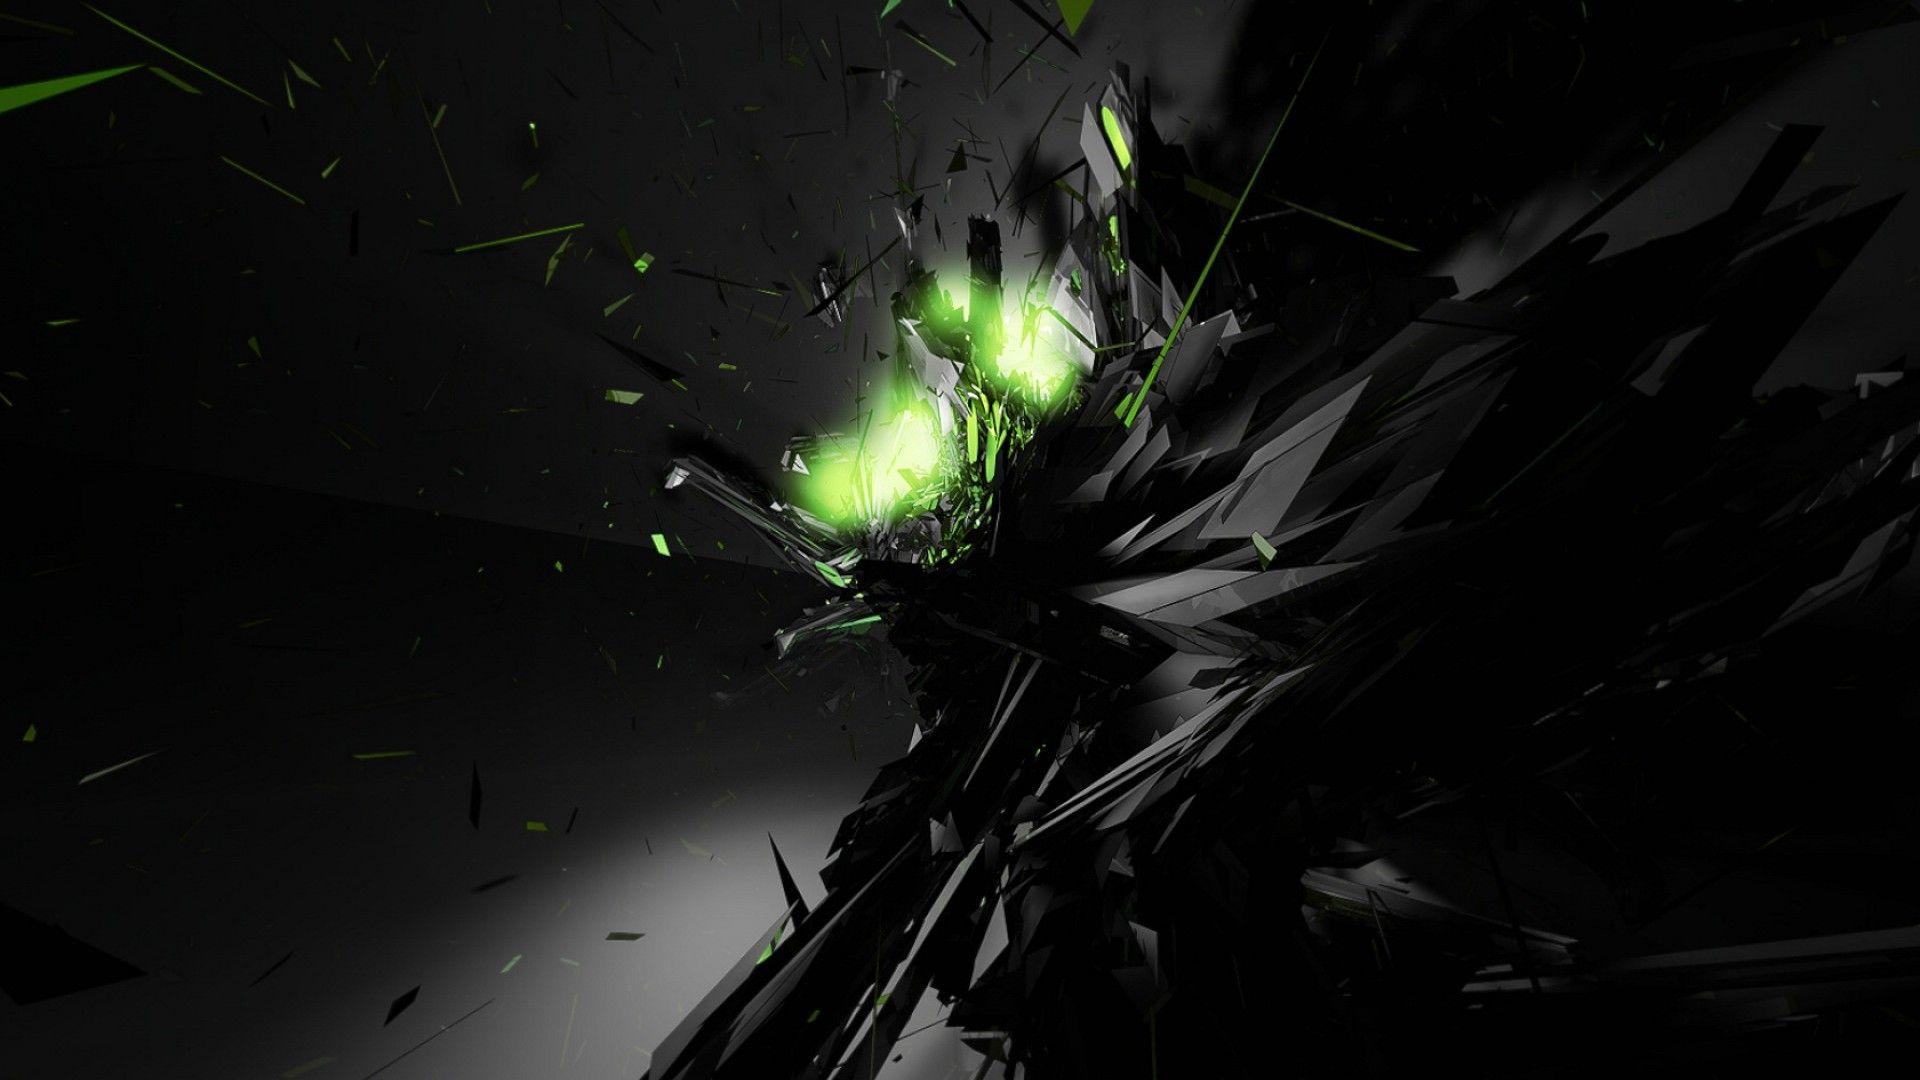 Green Glow Dark Black Wallpaper Cool Desktop Wallpapers Abstract Wallpaper